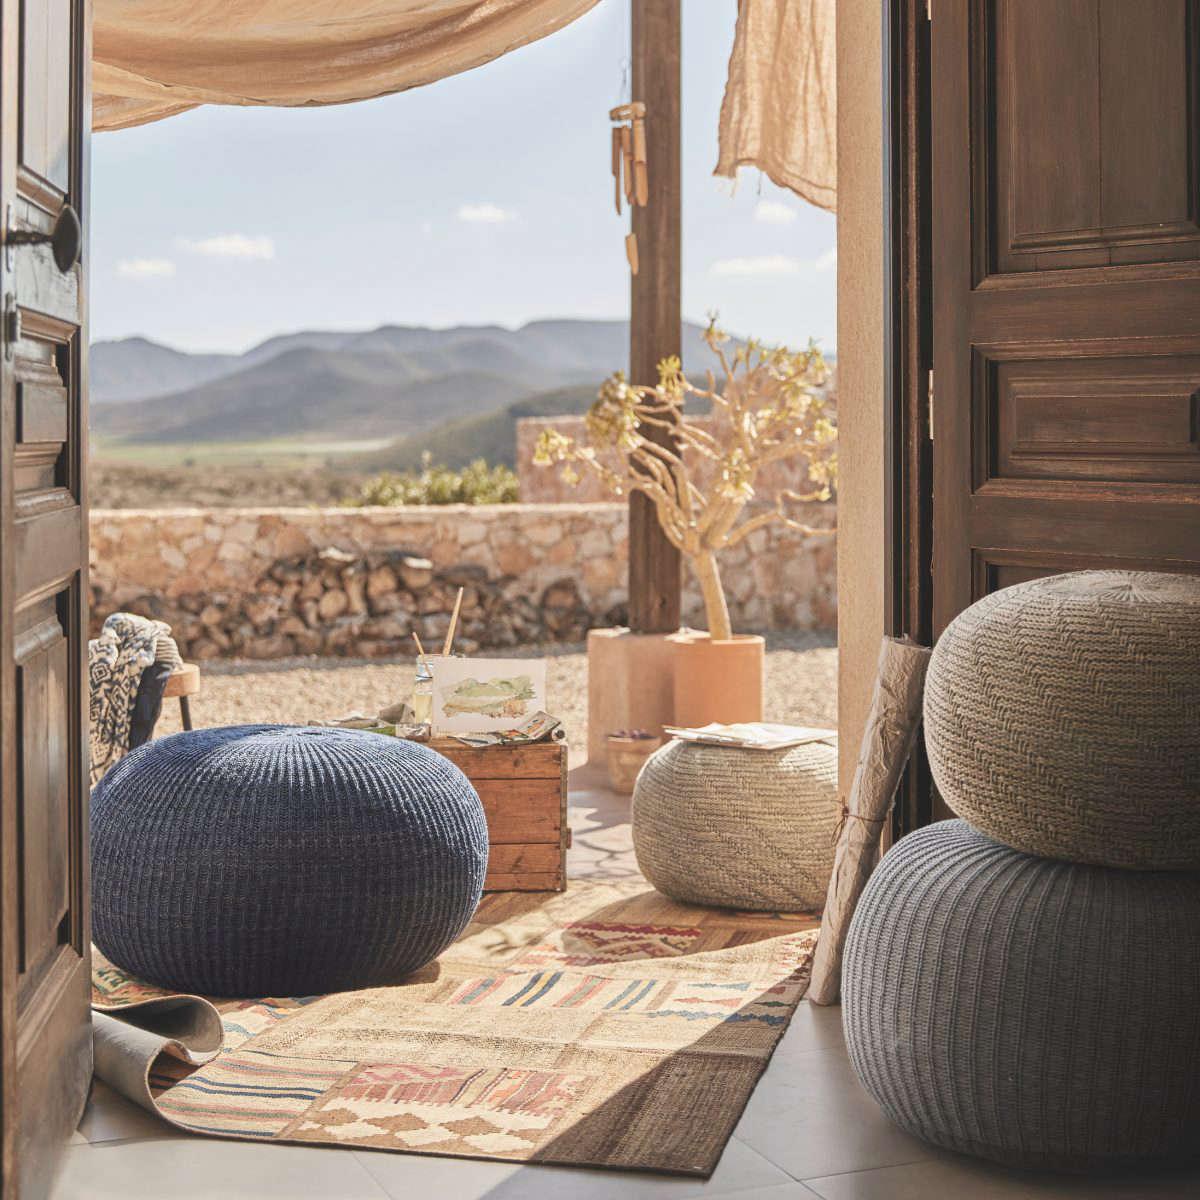 New From Ikea The Indoor Outdoor Life For Under 100 Gardenista